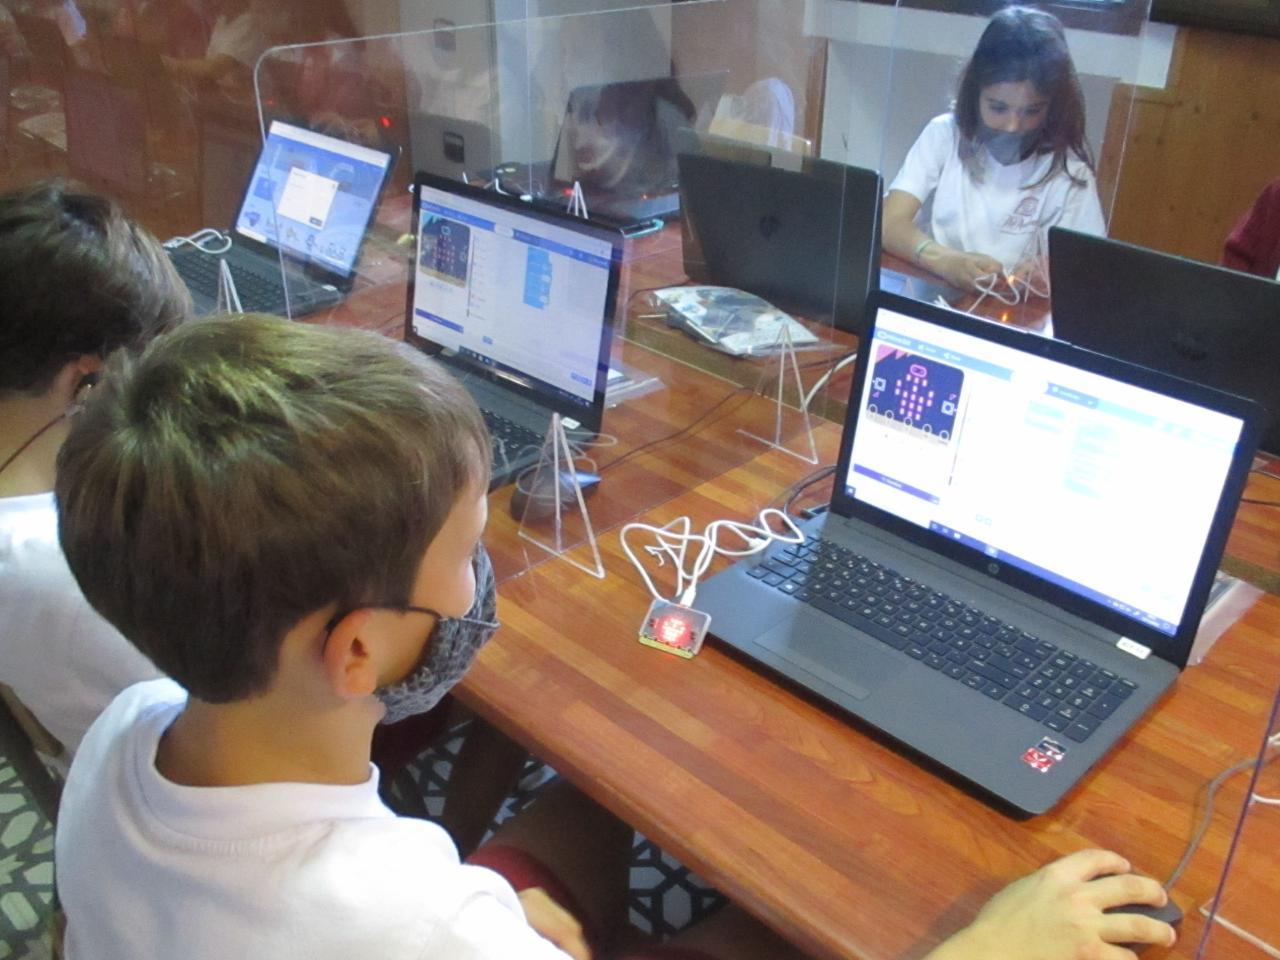 ICT Class Junior 1 at The Academy Junior School